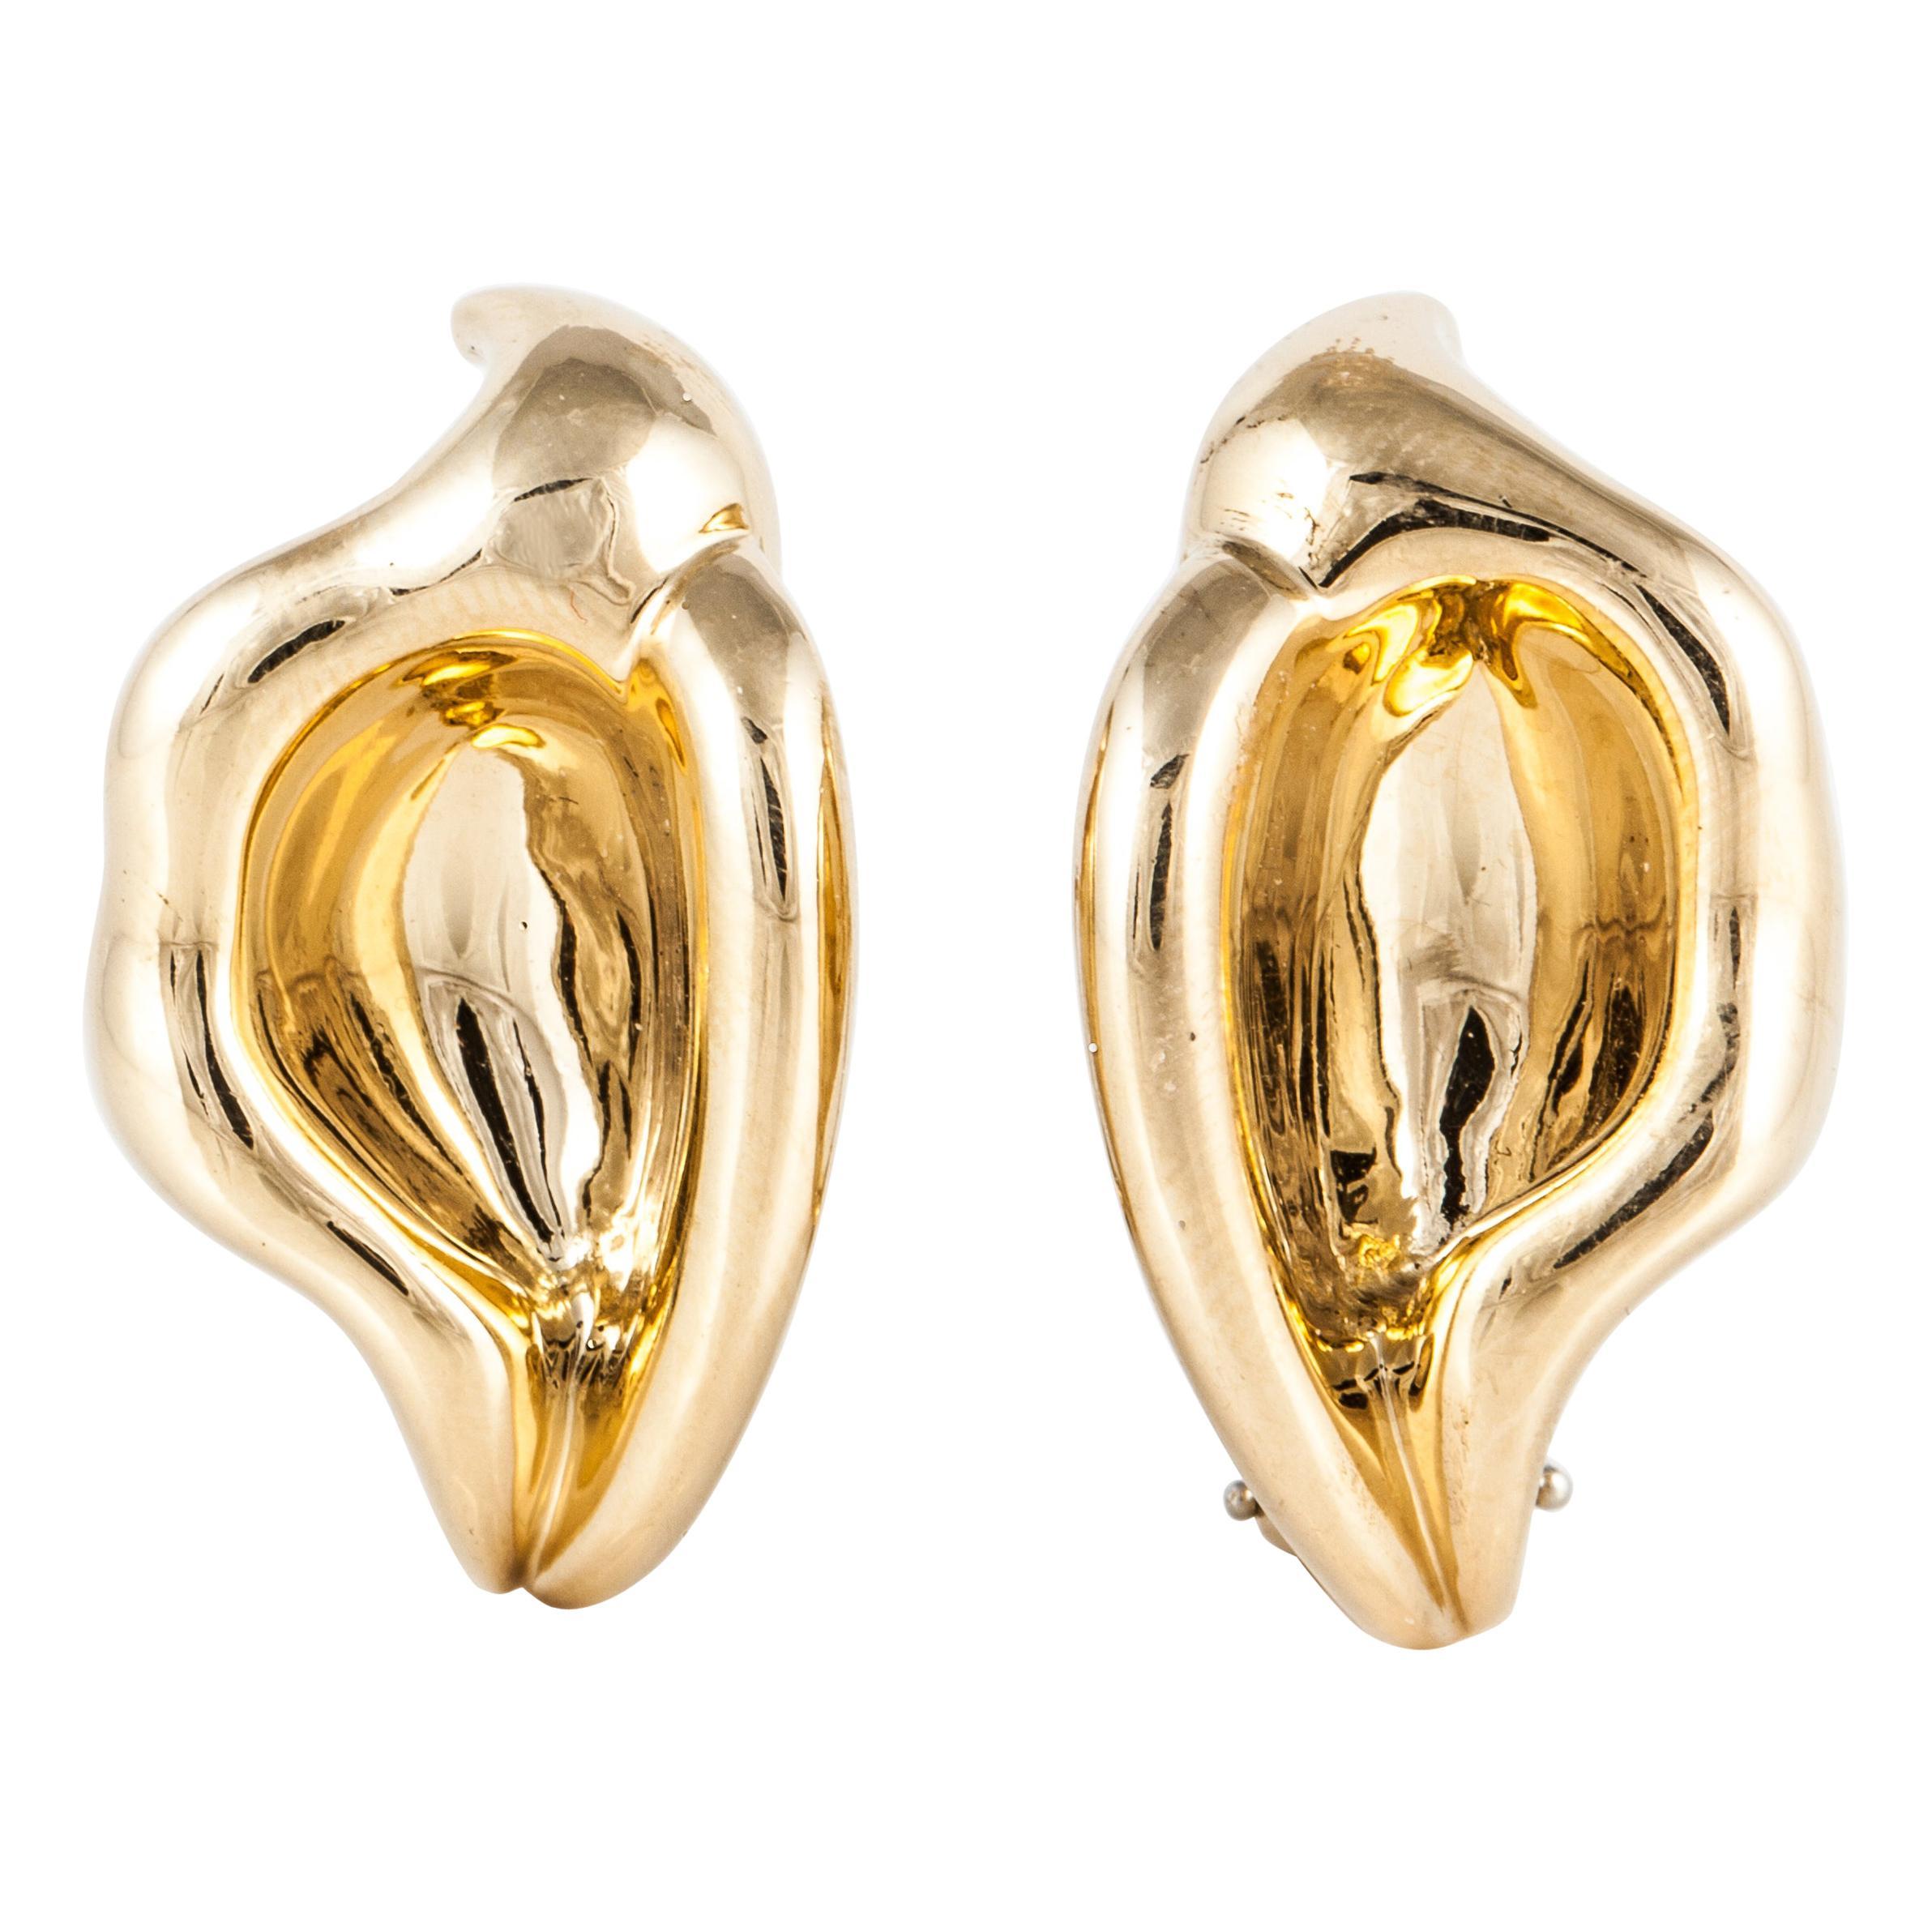 Tiffany & Co. Elsa Peretti Calla Lily Earrings in 18K Gold